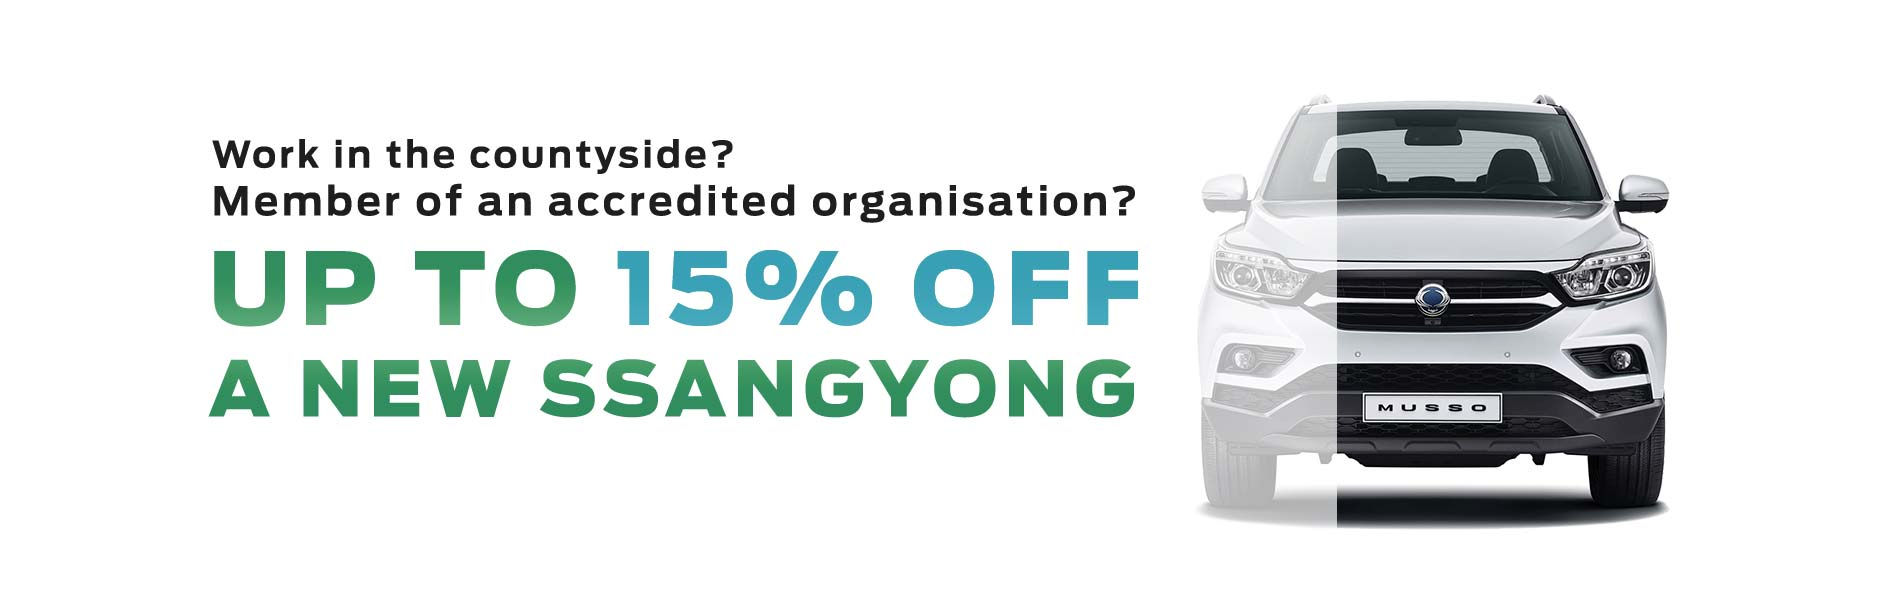 rural-workers-membership-discount-new-ssangyong-sli-2